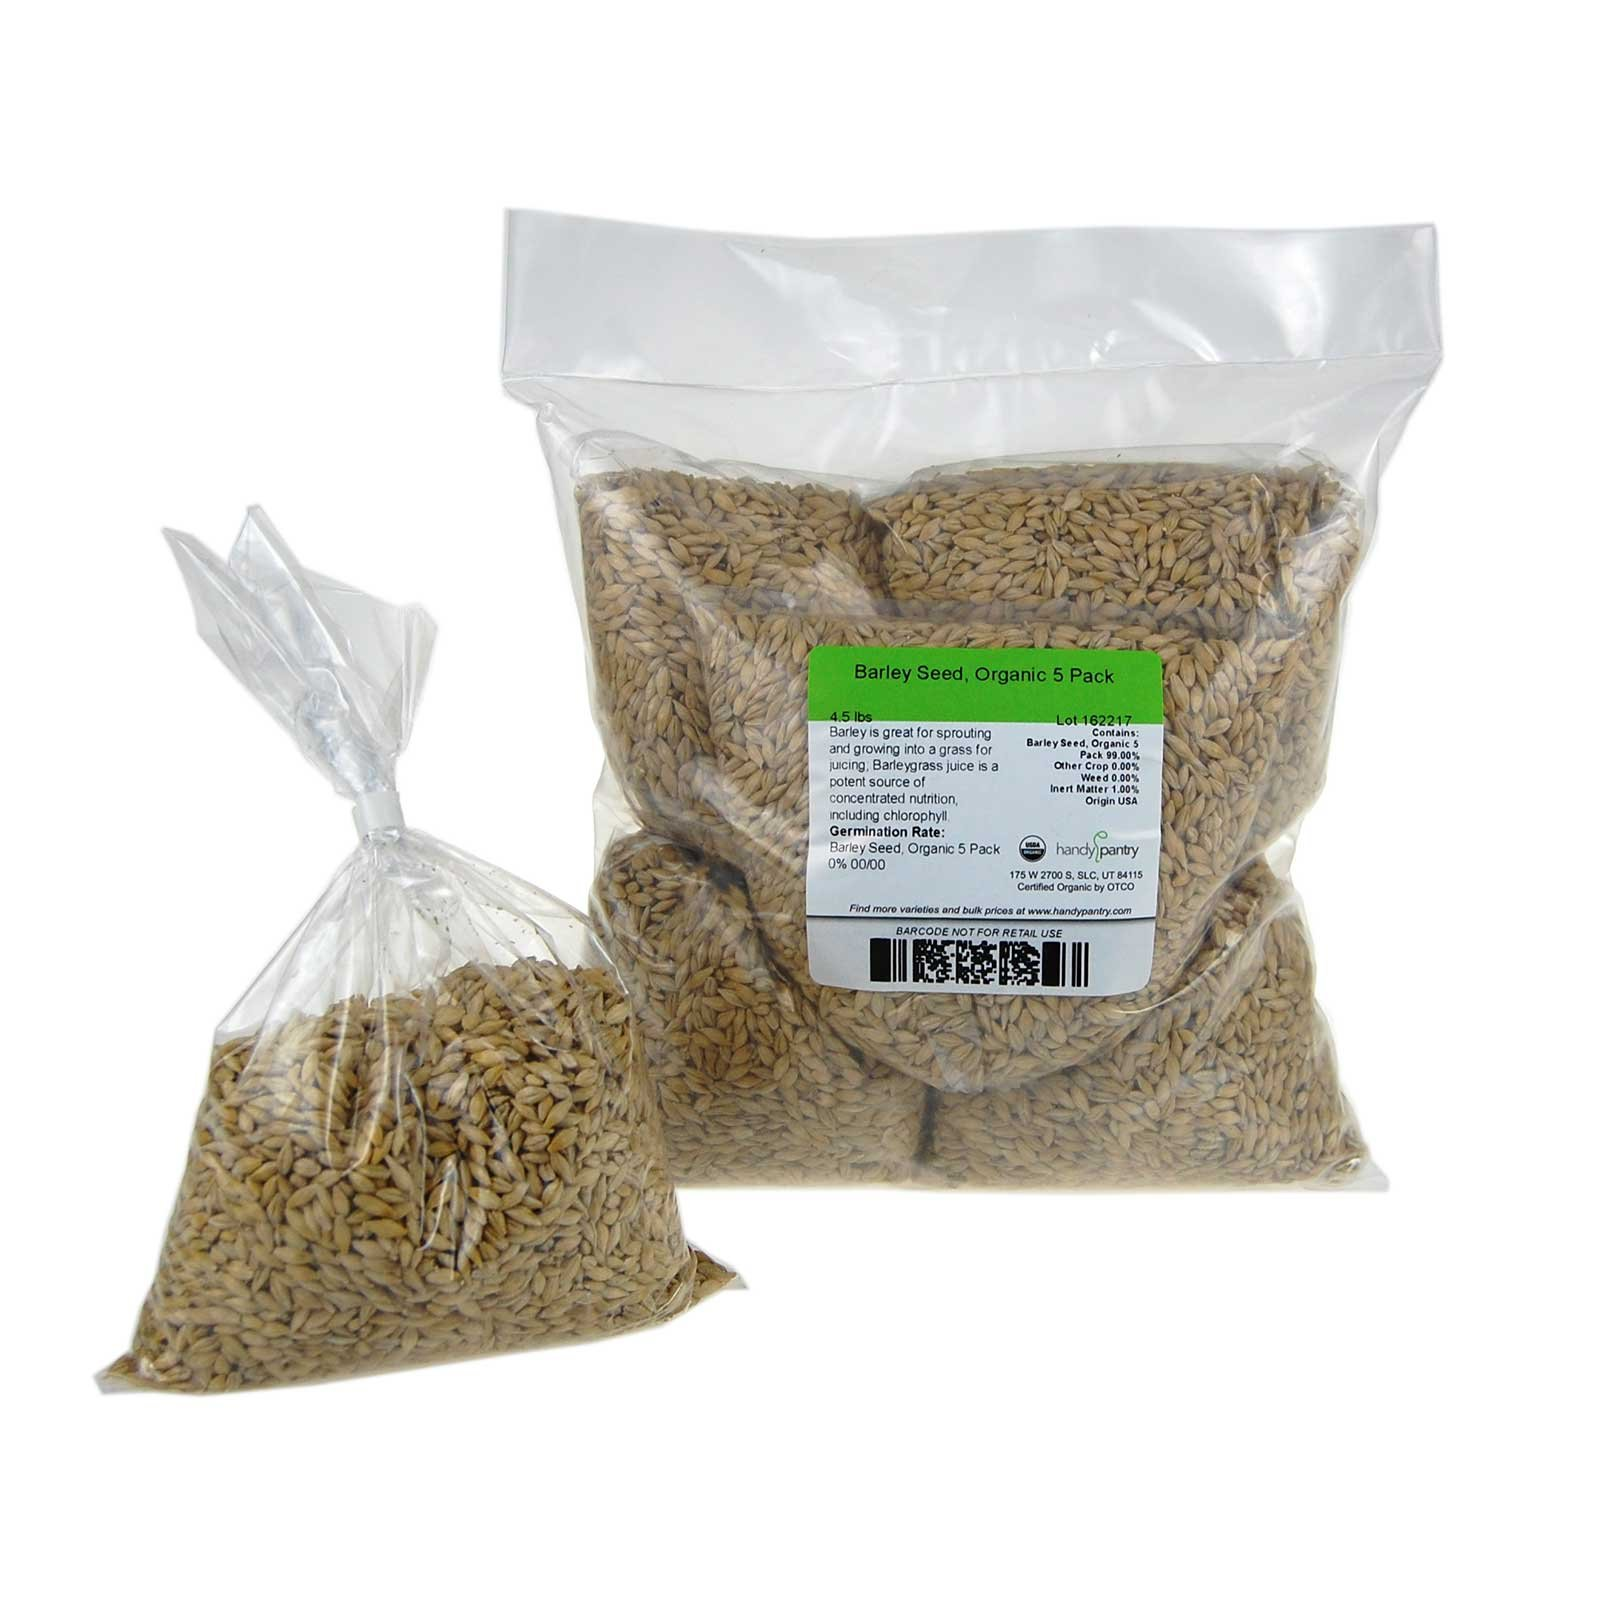 Organic Barley Seeds - 4.5 Lbs in Pre-Measured Bags for 10x20 Trays - Whole (Hull Intact) Barleygrass Seed - Ornamental Barley Grass, Juicing